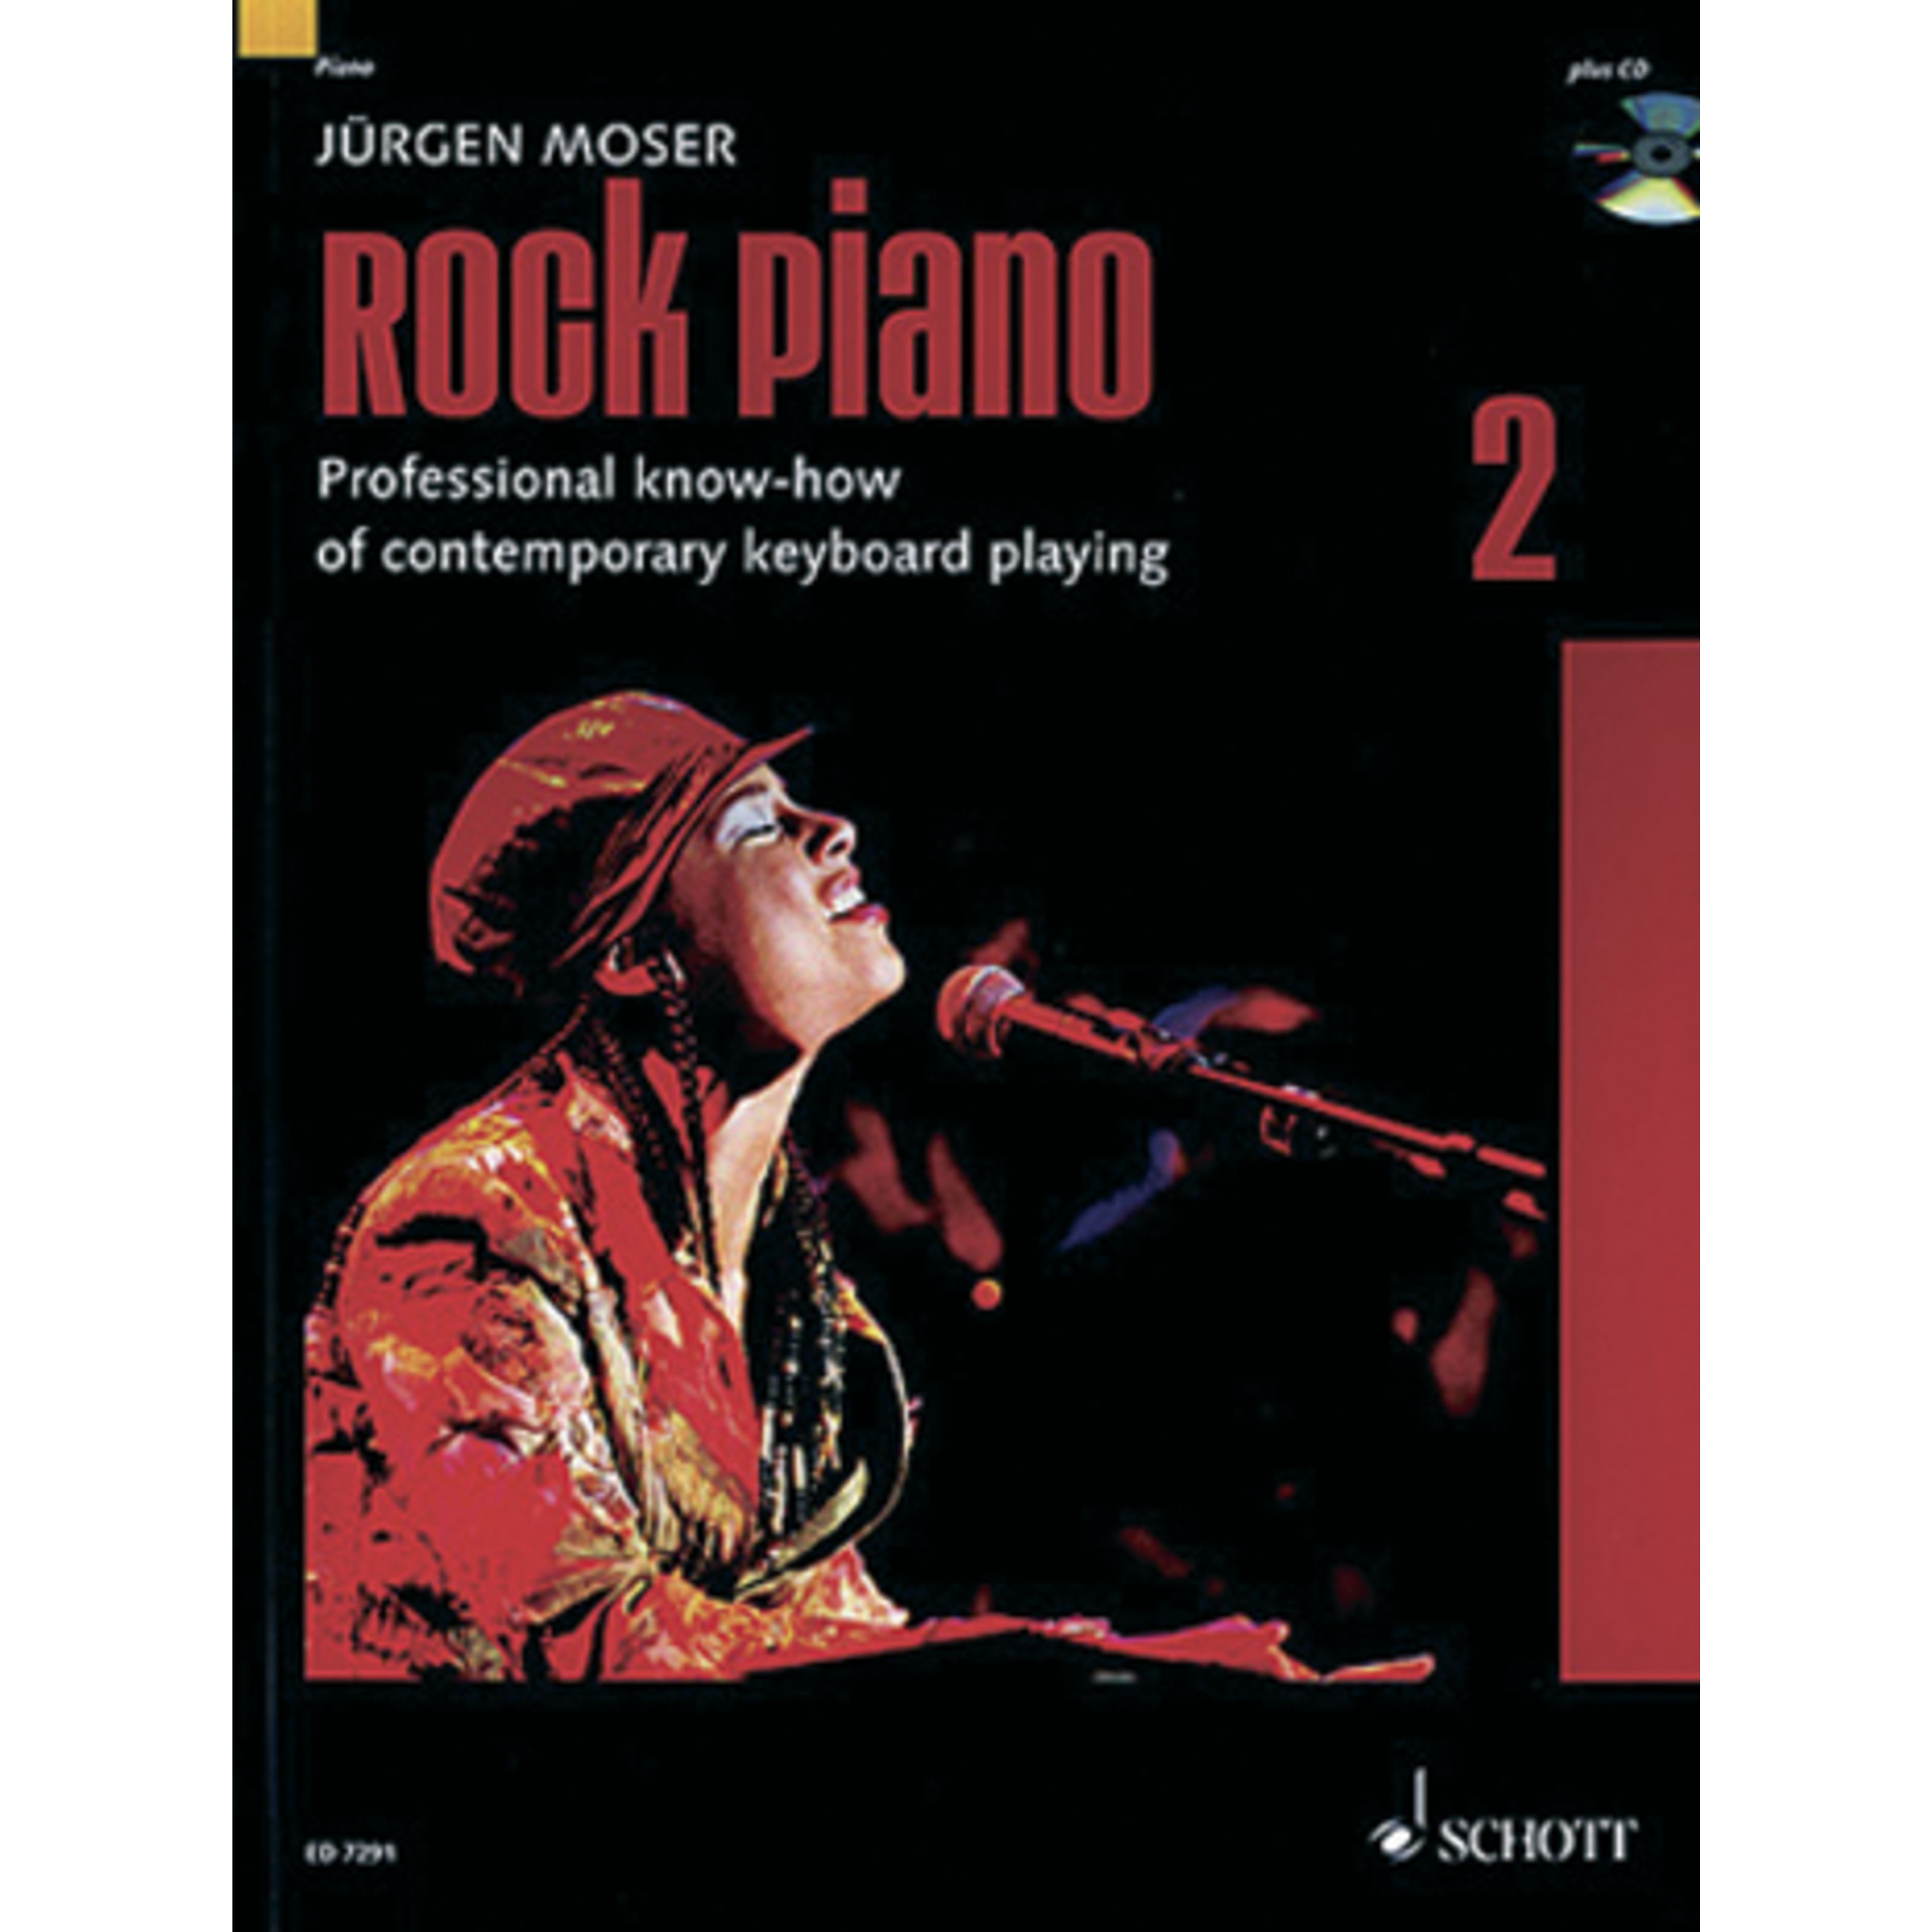 Schott Music - Rock Piano 2 Jürgen Moser,inkl. CD ED 7291